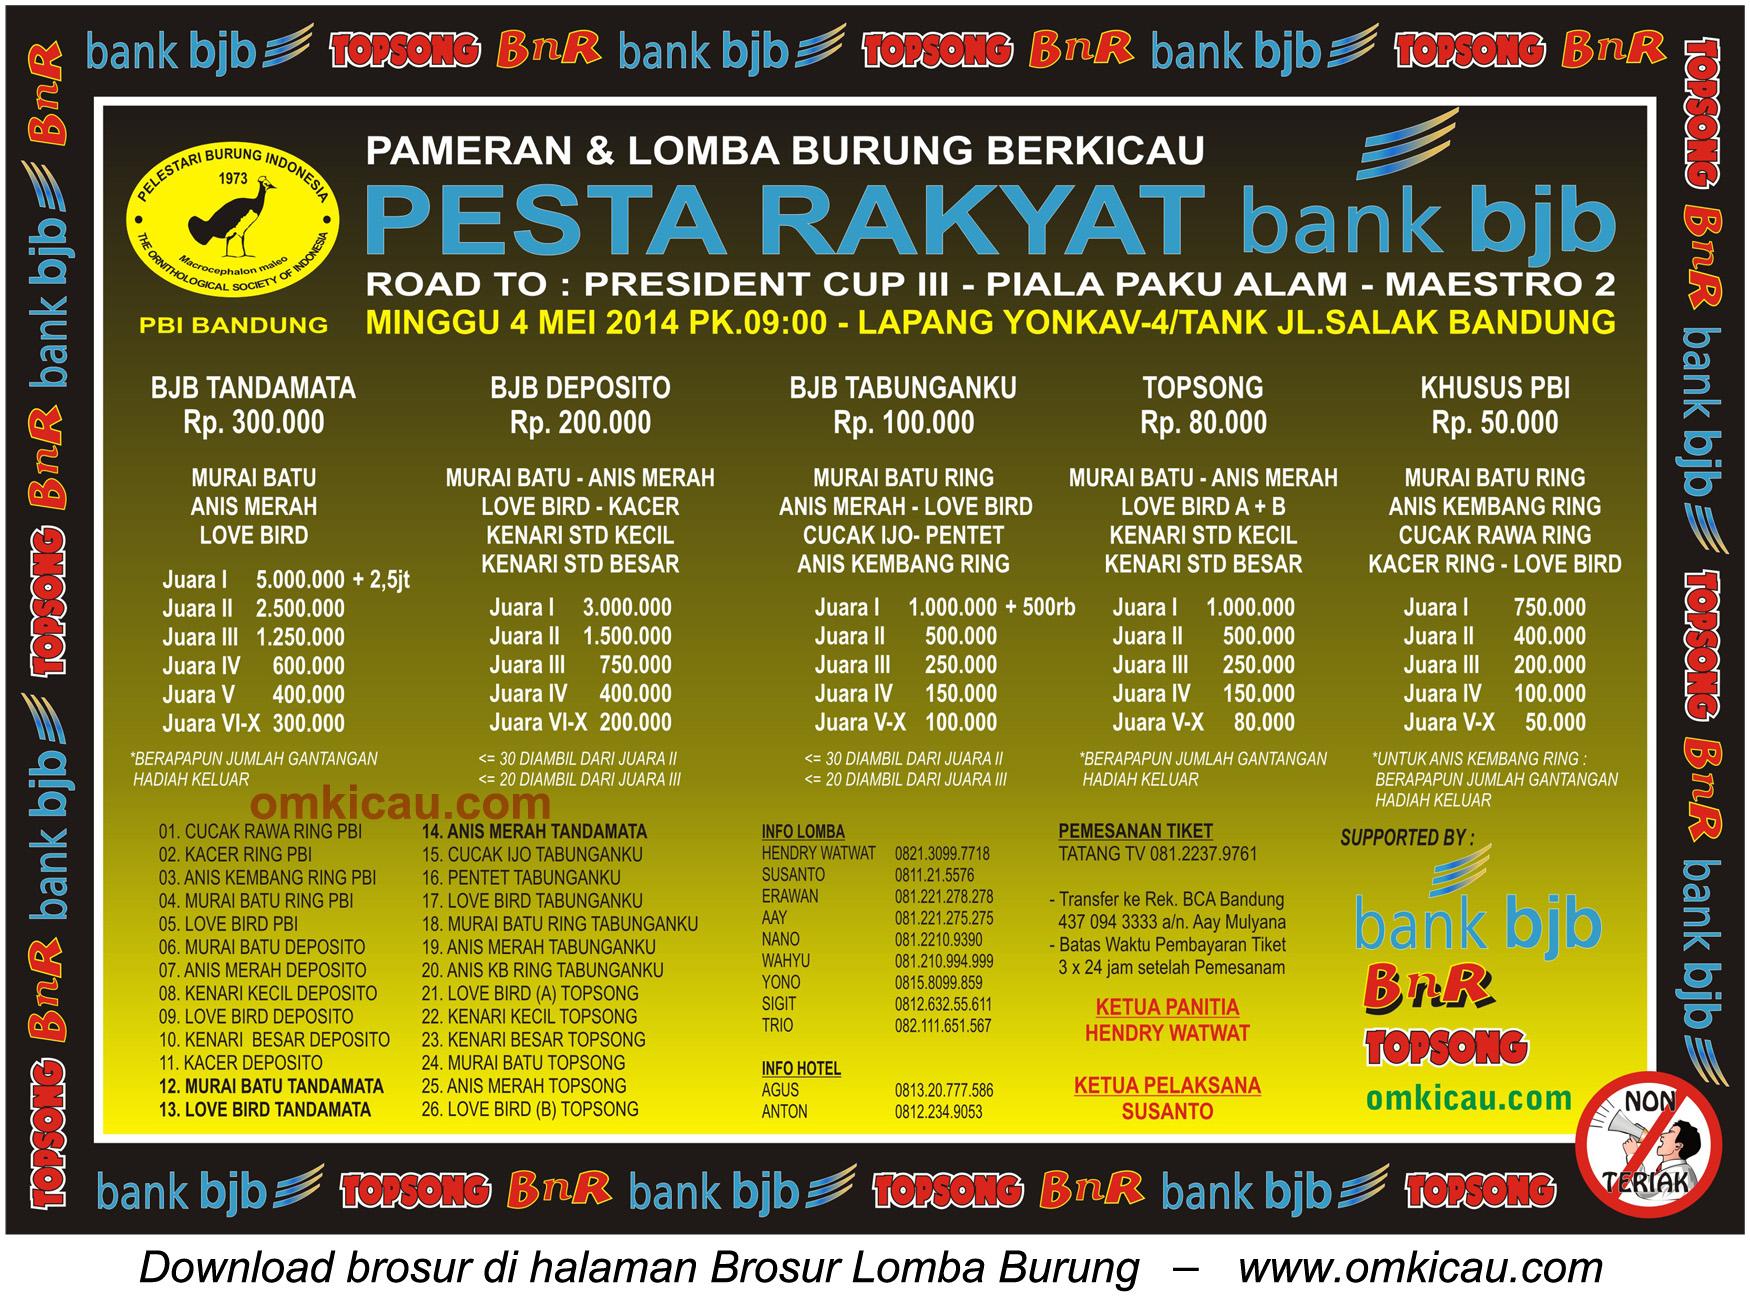 Brosur Lomba Burung Berkicau Pesta Rakyat Bank BJB, Bandung, 4 Mei 2014